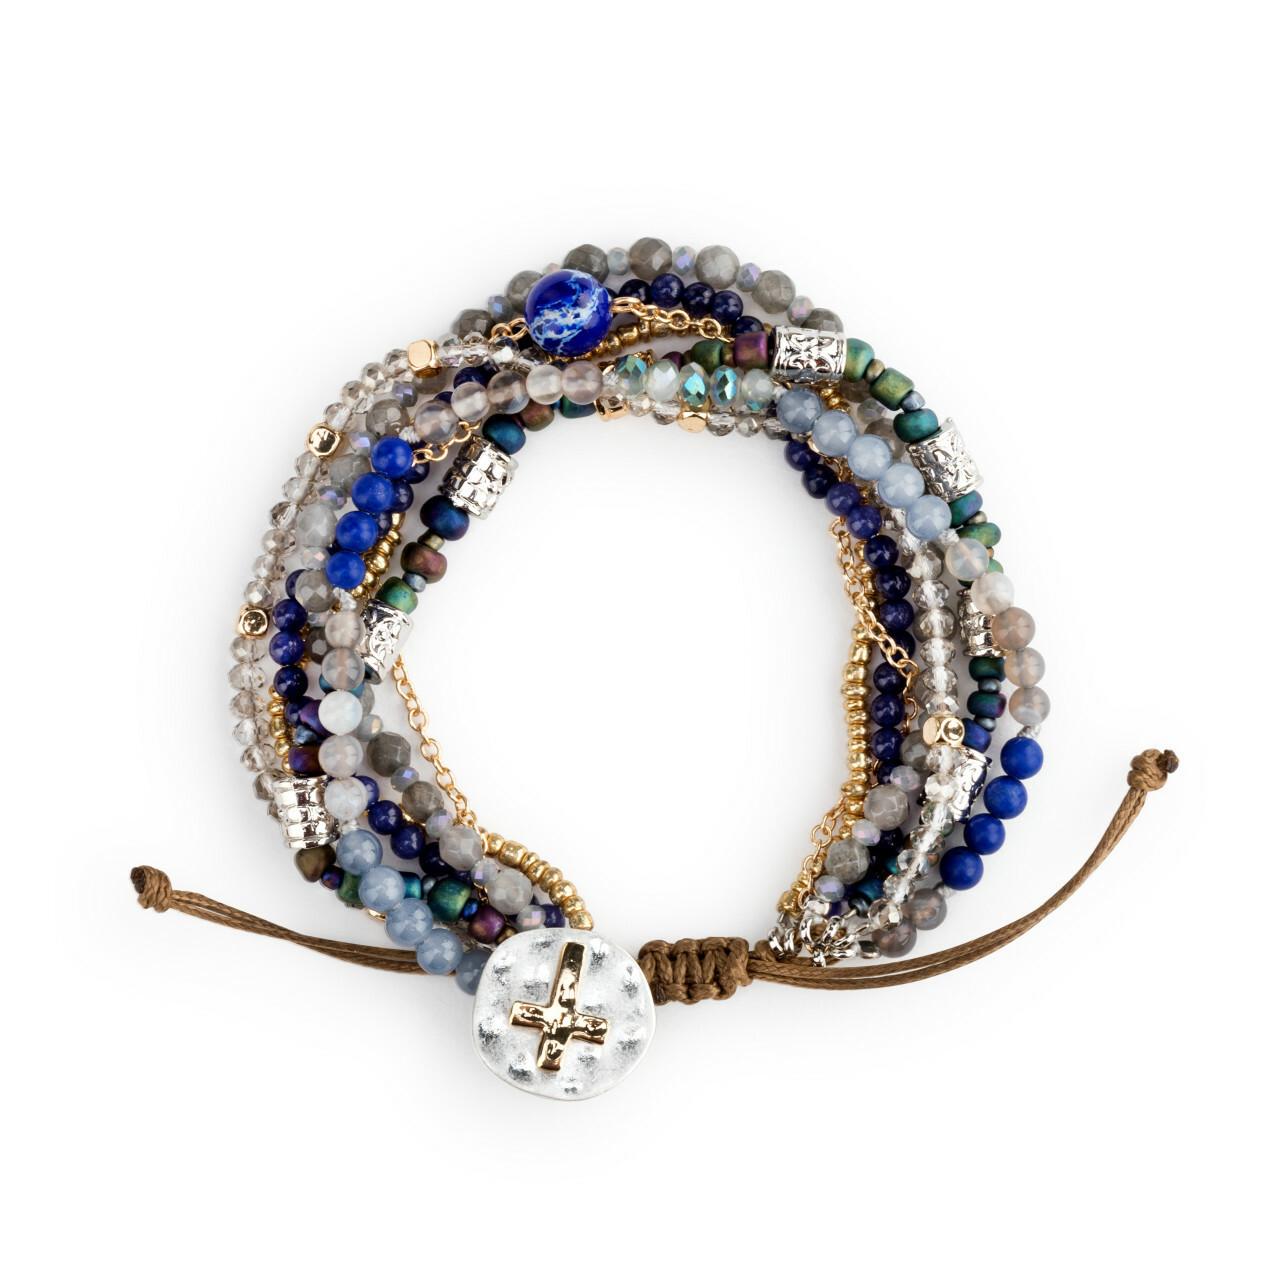 A lot happens in seven days prayer bracelet indigo